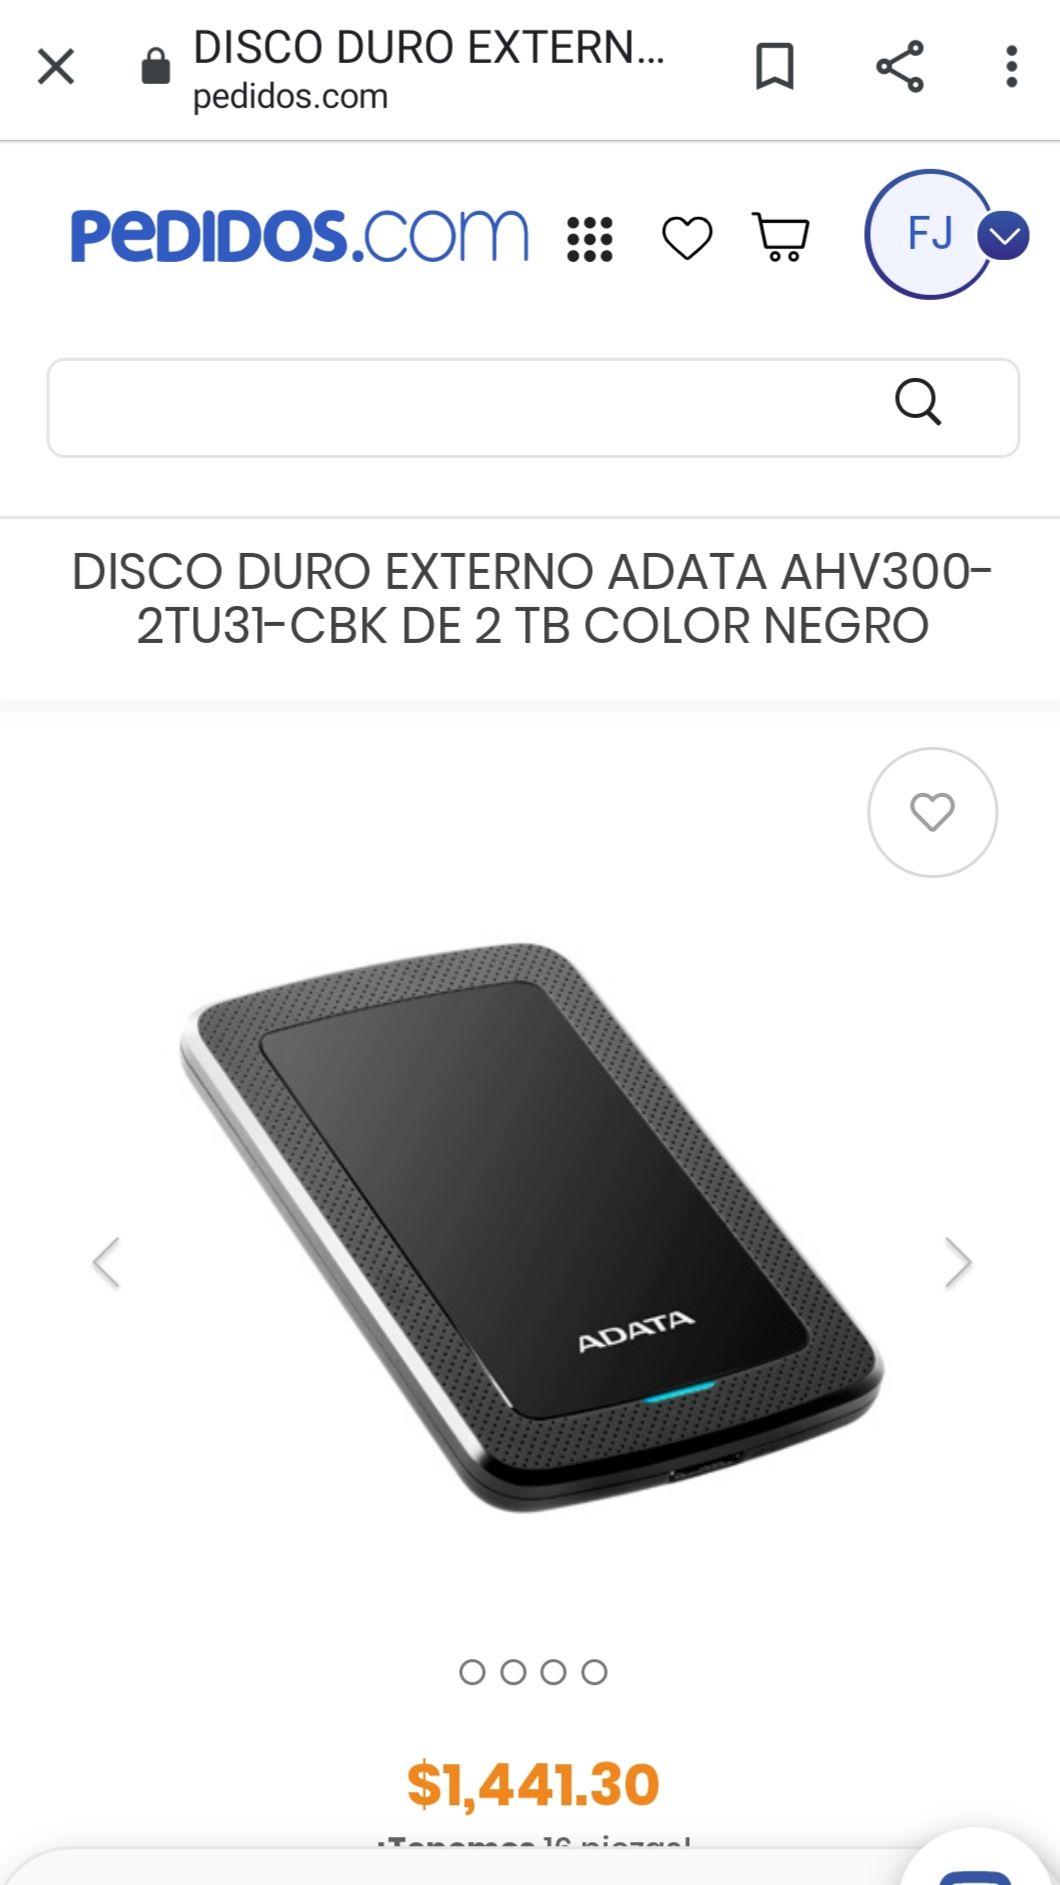 Pedidos.com Disco duro Adata 2tb usb 3.1